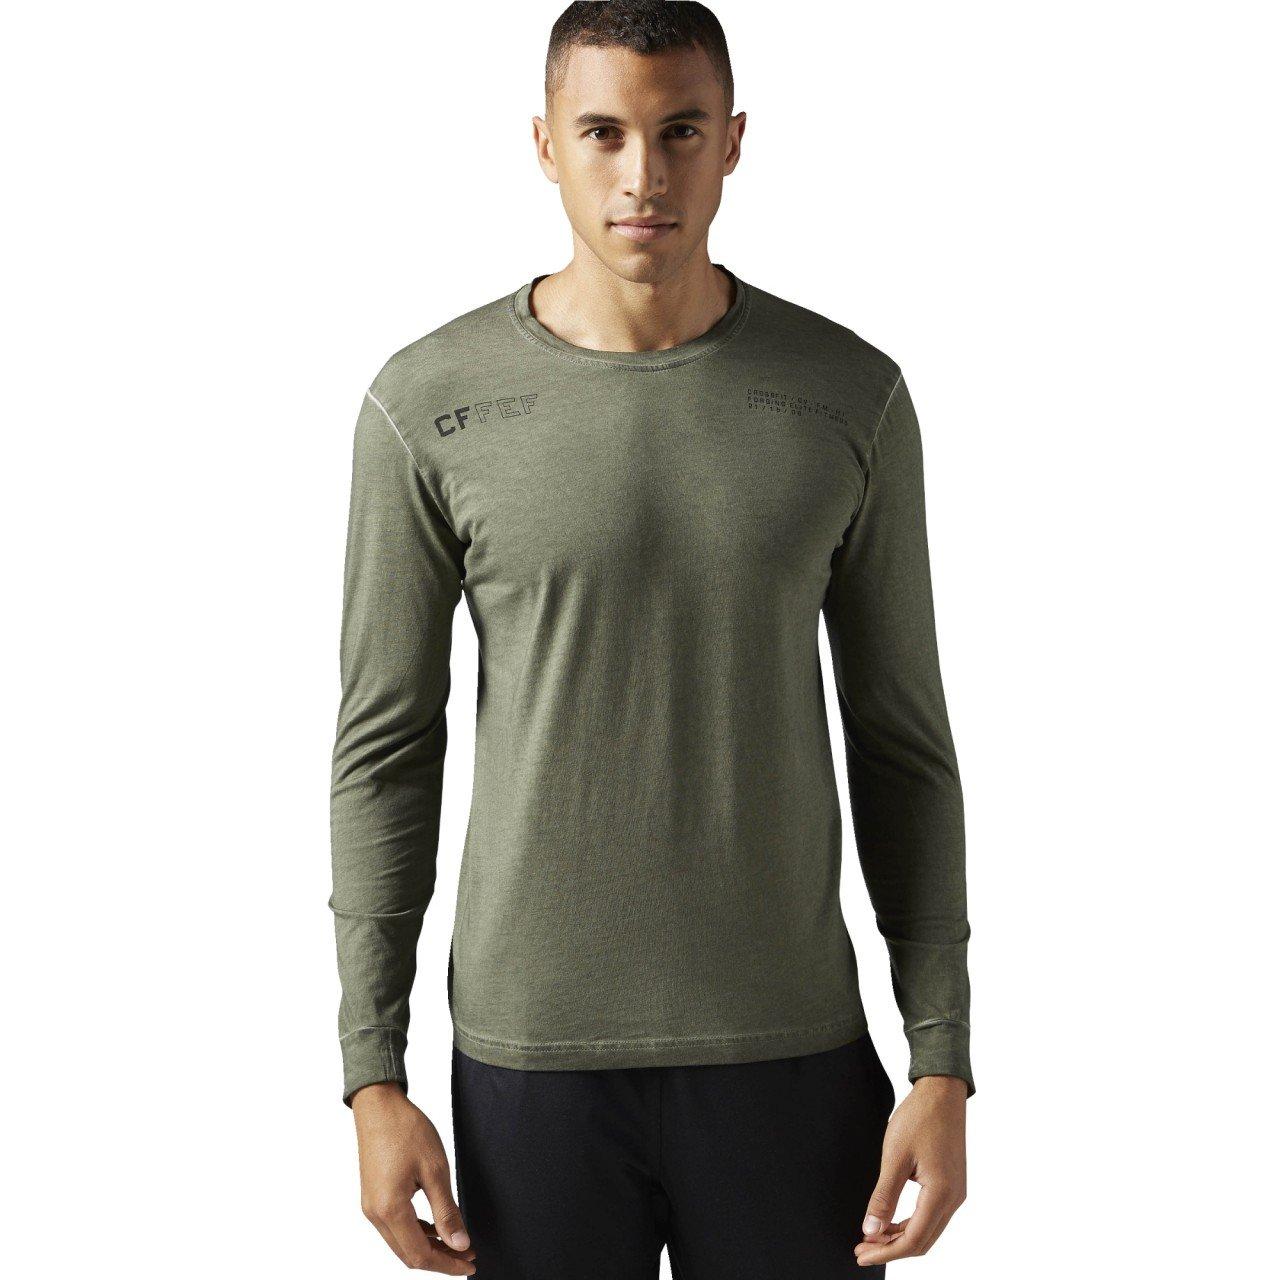 Reebok Herren RCF Washed Long Sleeve Langearmshirt